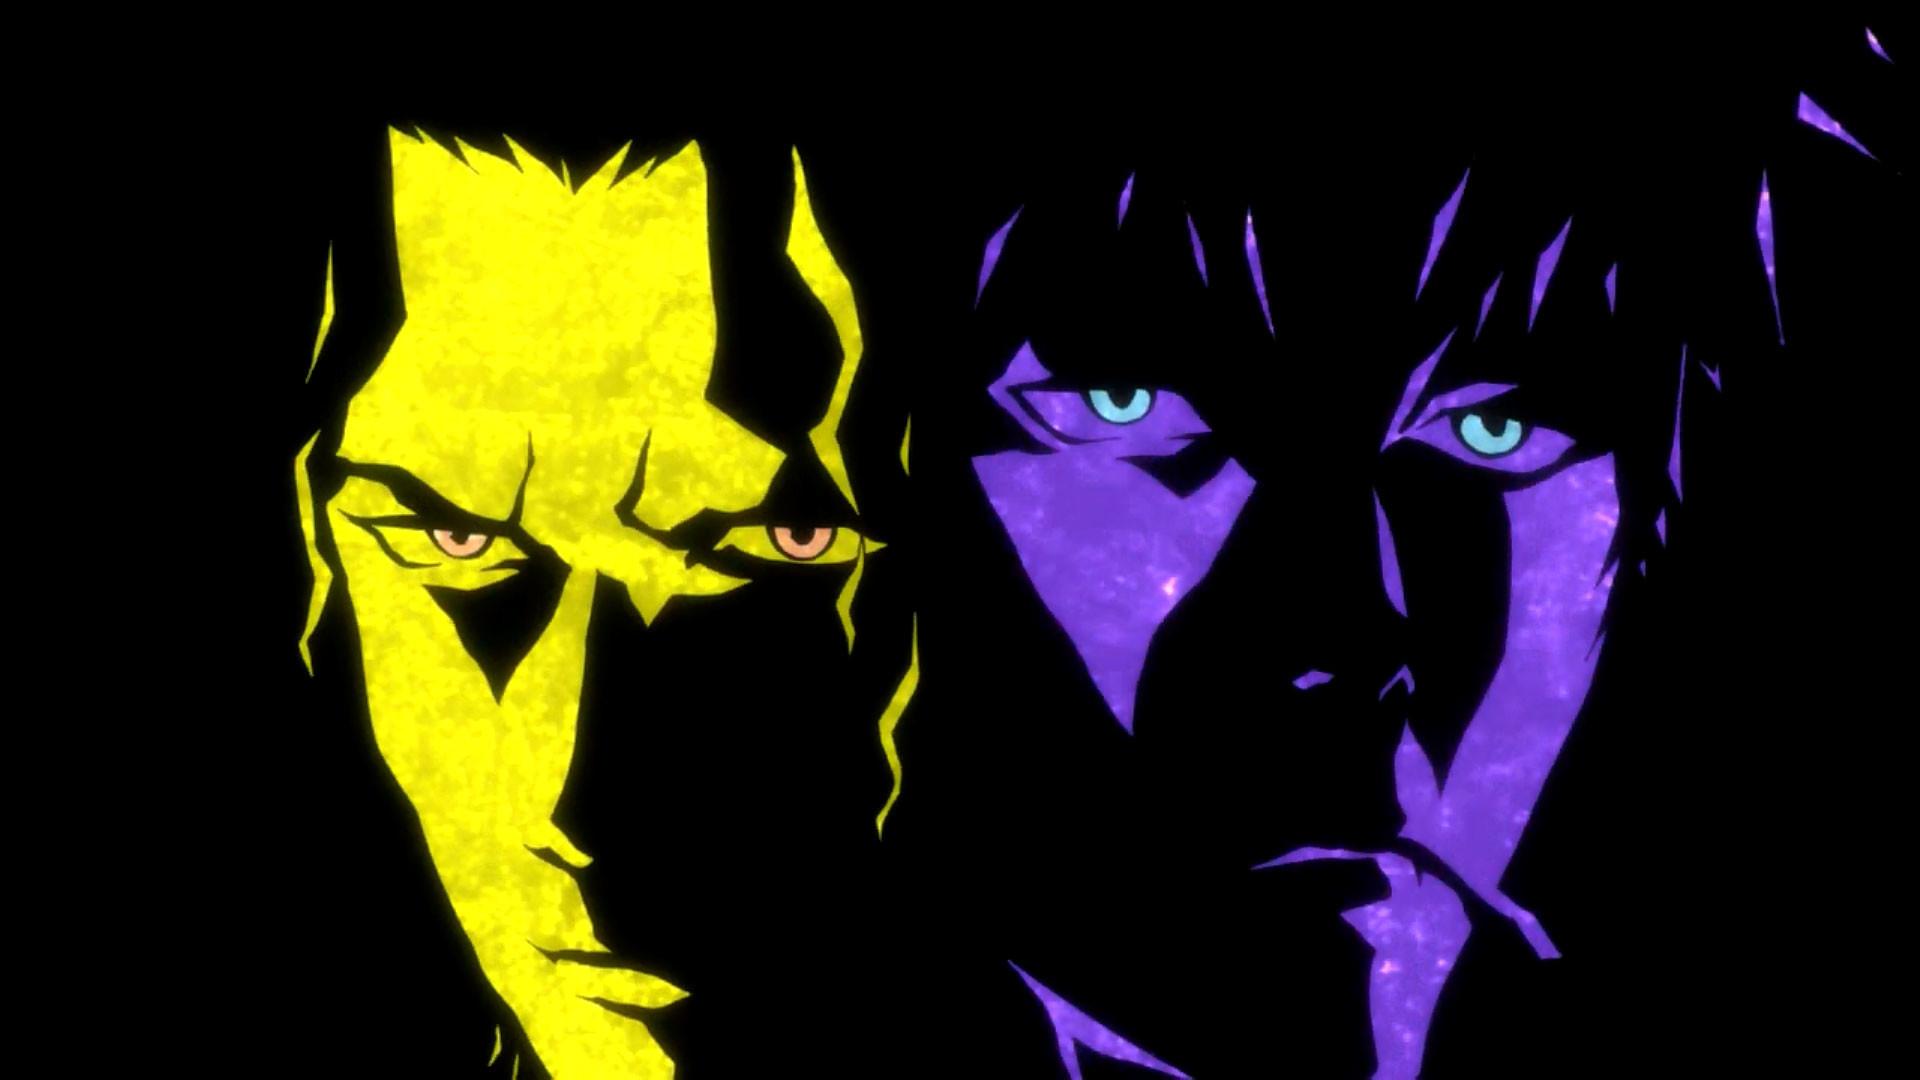 Shirobako Anime Wallpaper Psycho-Pass Season 2 Anime